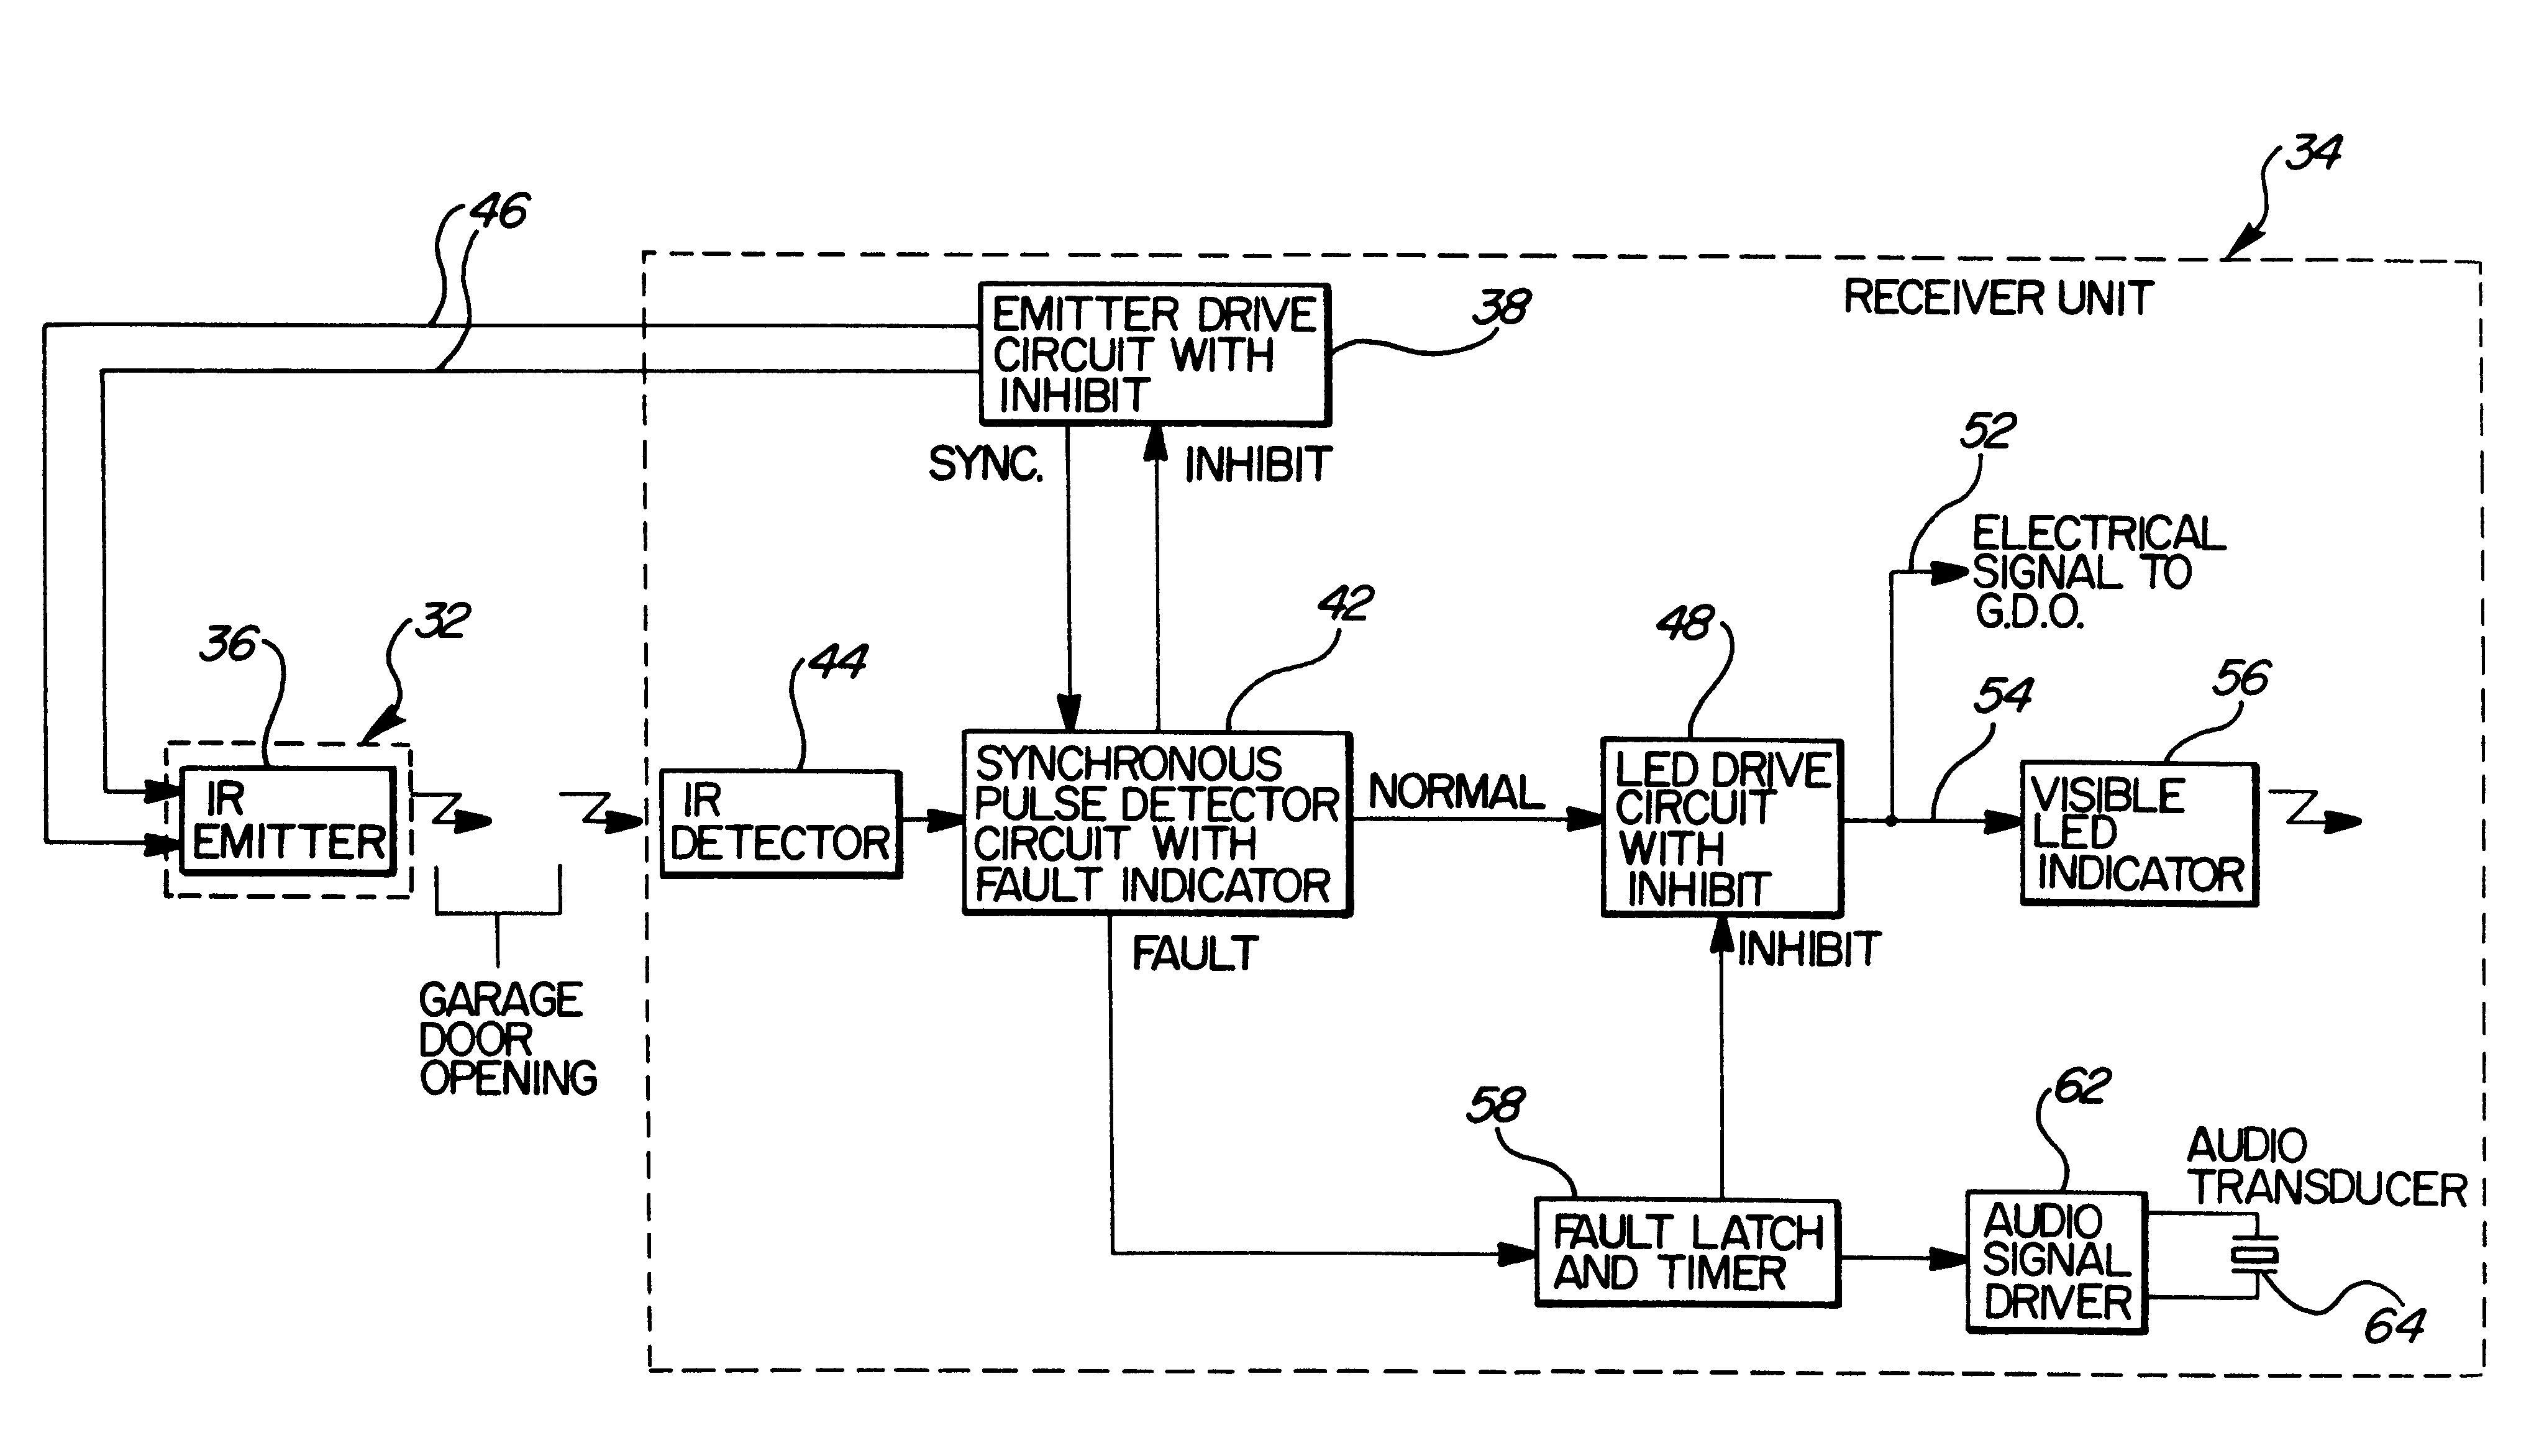 Chamberlain garage door opener wiring diagram httpvoteno123 chamberlain garage door opener wiring diagram cheapraybanclubmaster Image collections